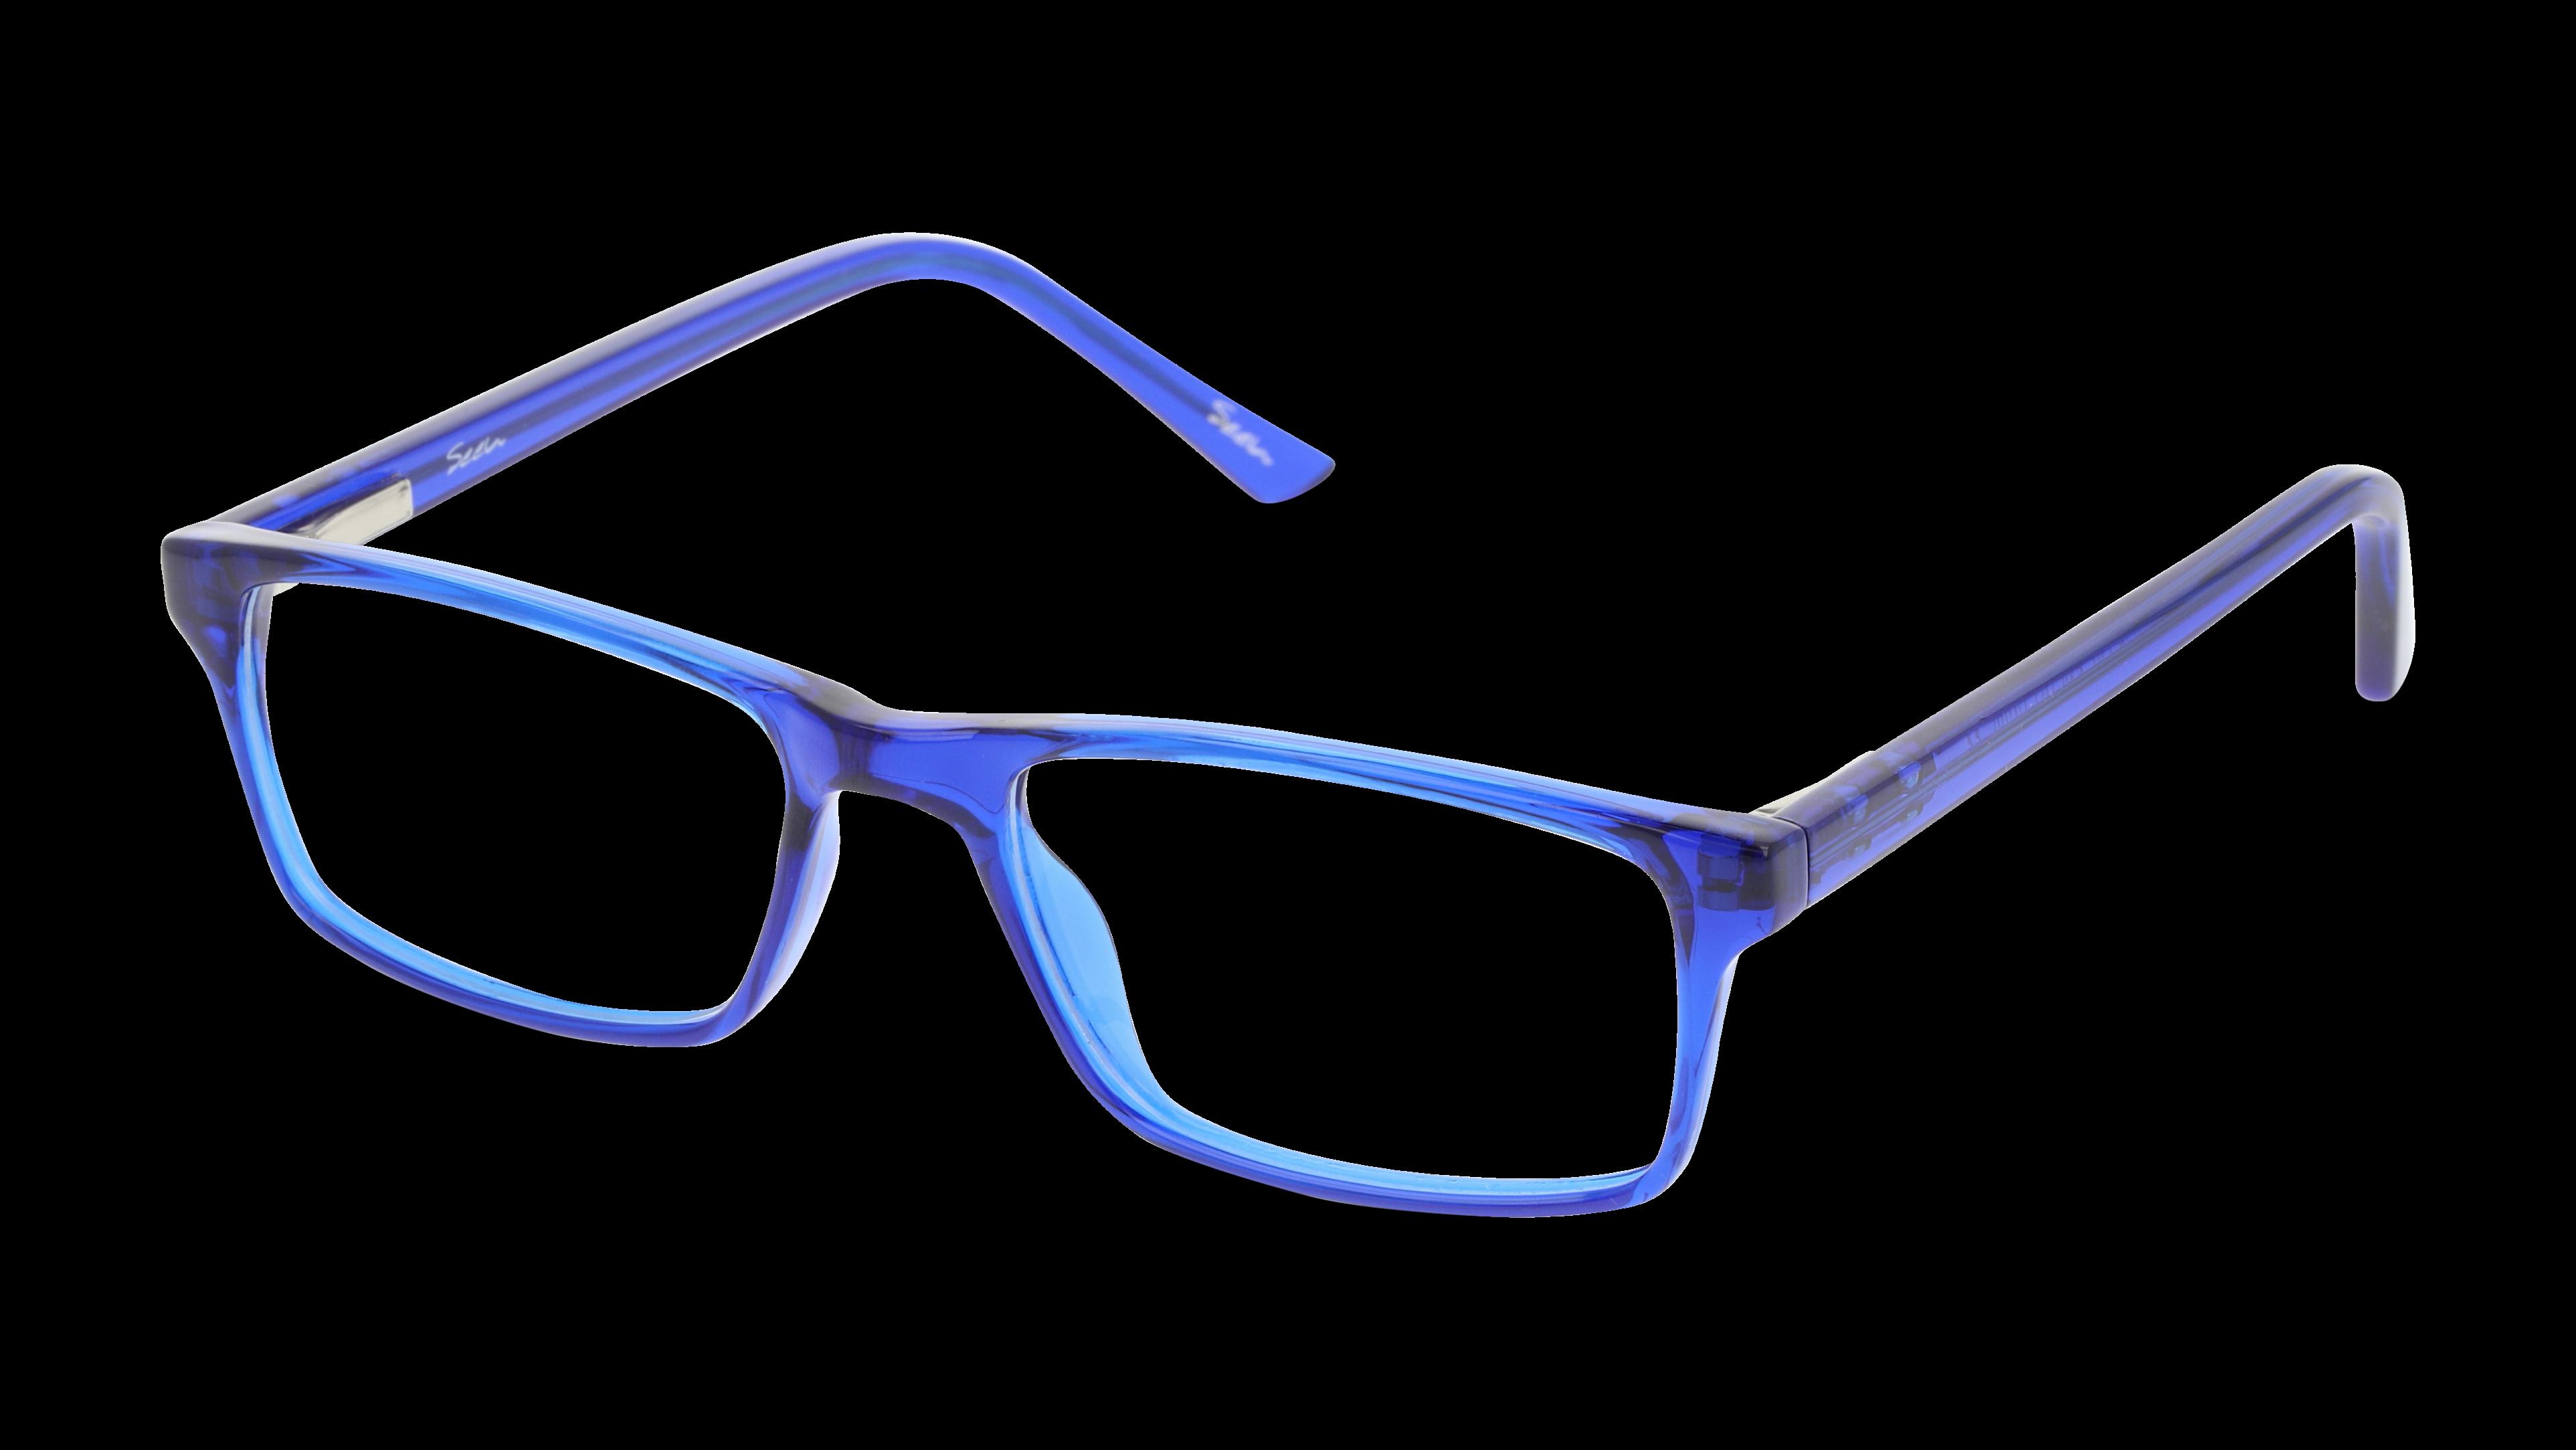 Angle_Left01 Seen Seen SNFT07 CC00 48/16 Blauw